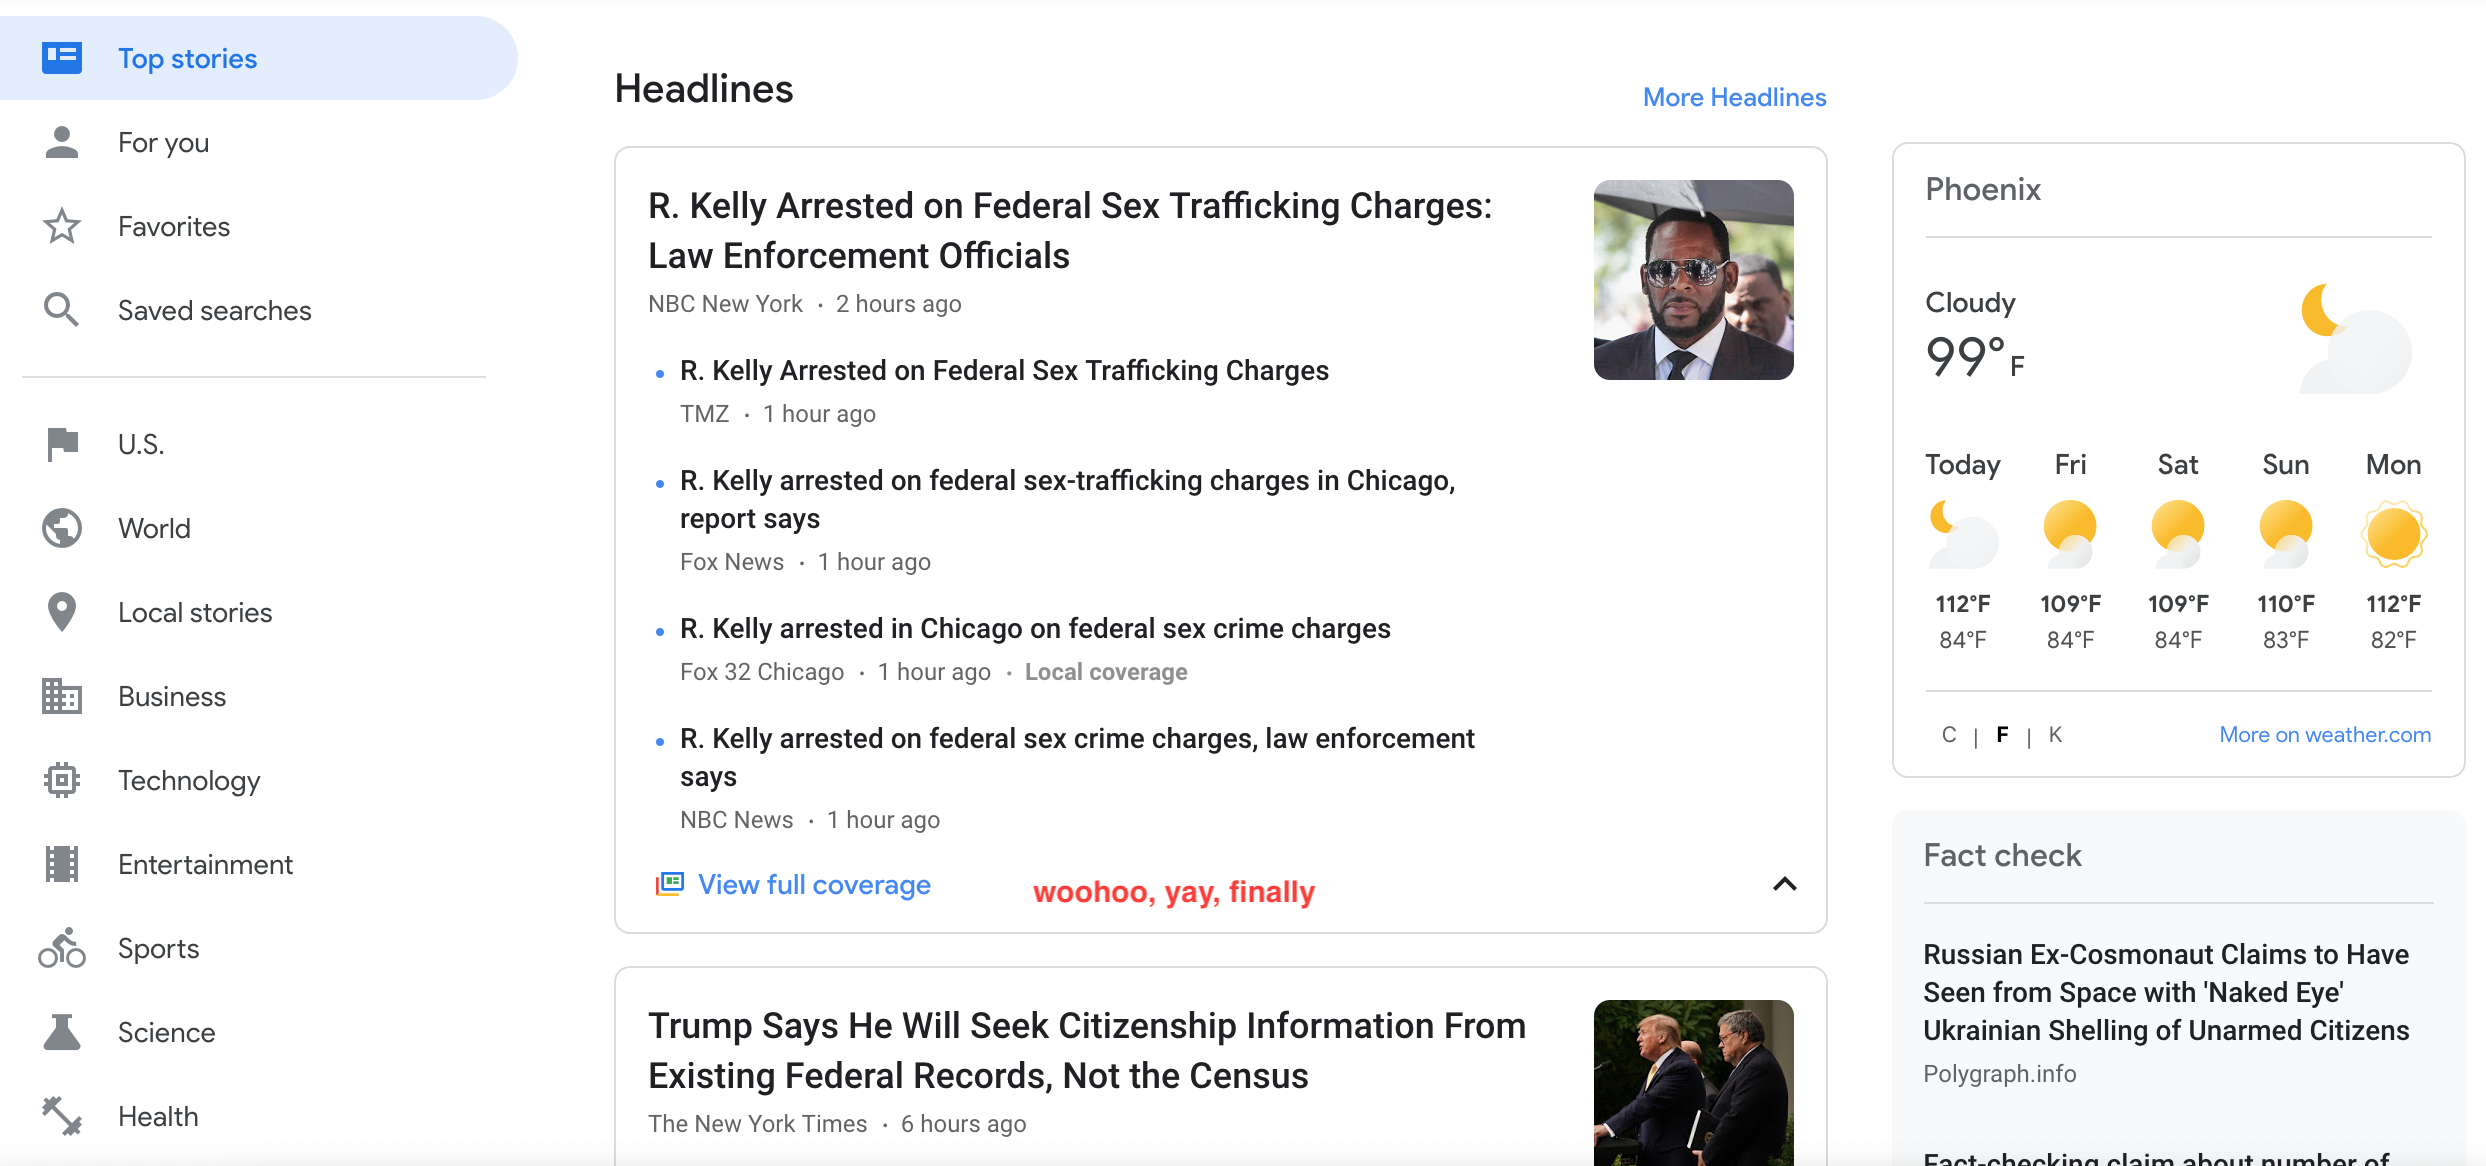 google-news-image.png